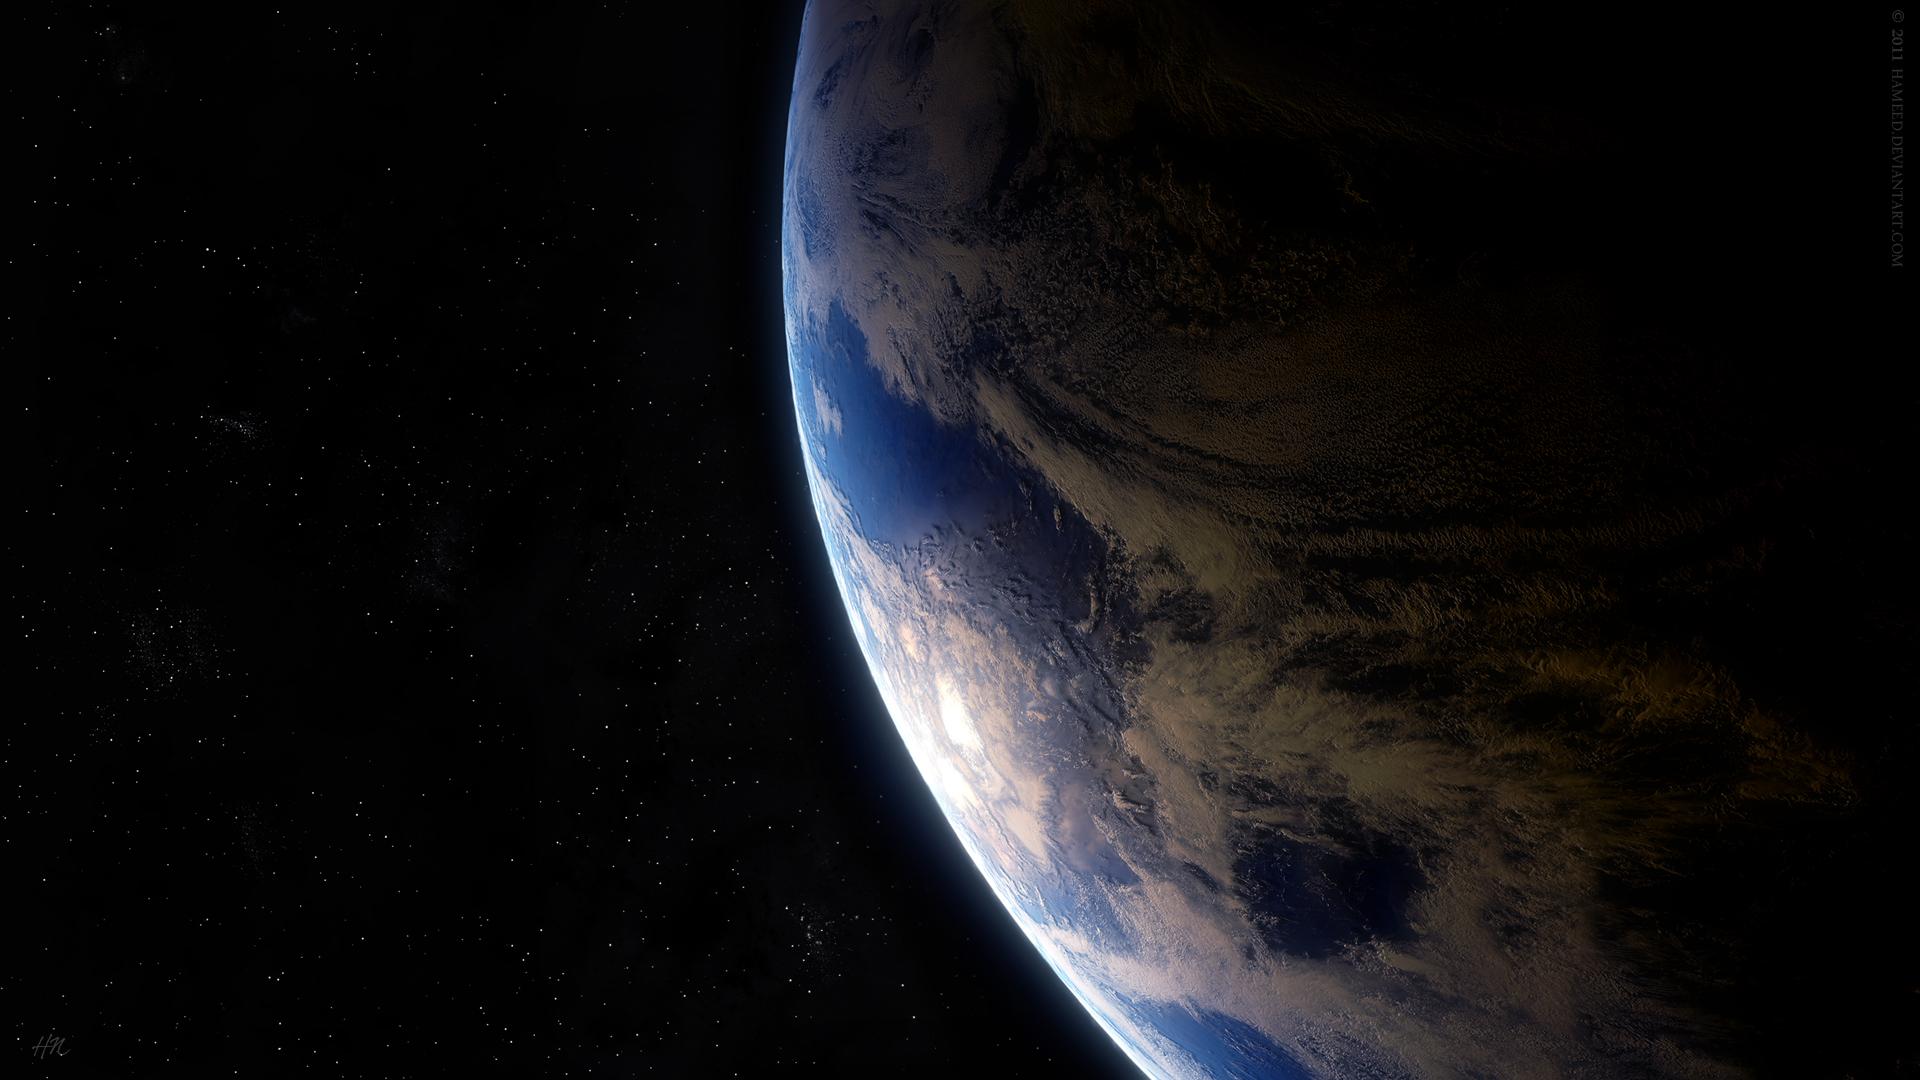 [72+] Cool Earth Backgrounds on WallpaperSafari